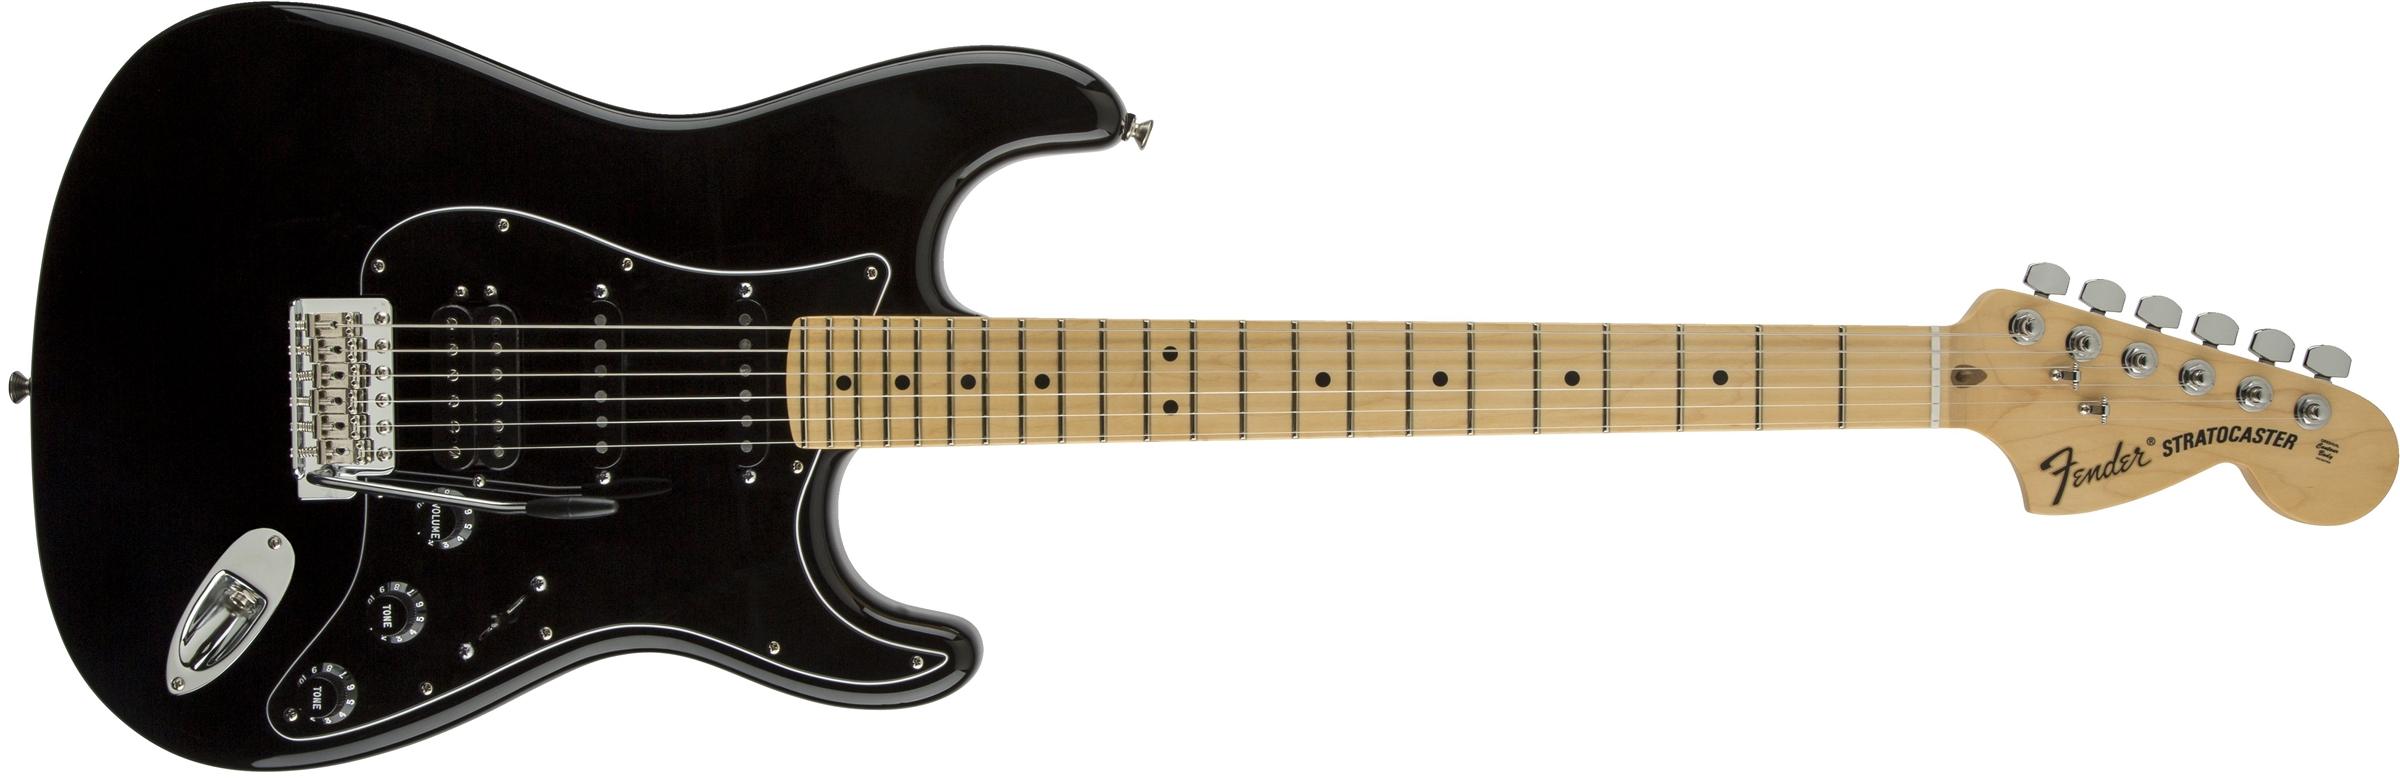 Fender american special stratocaster 174 hss maple fingerboard black